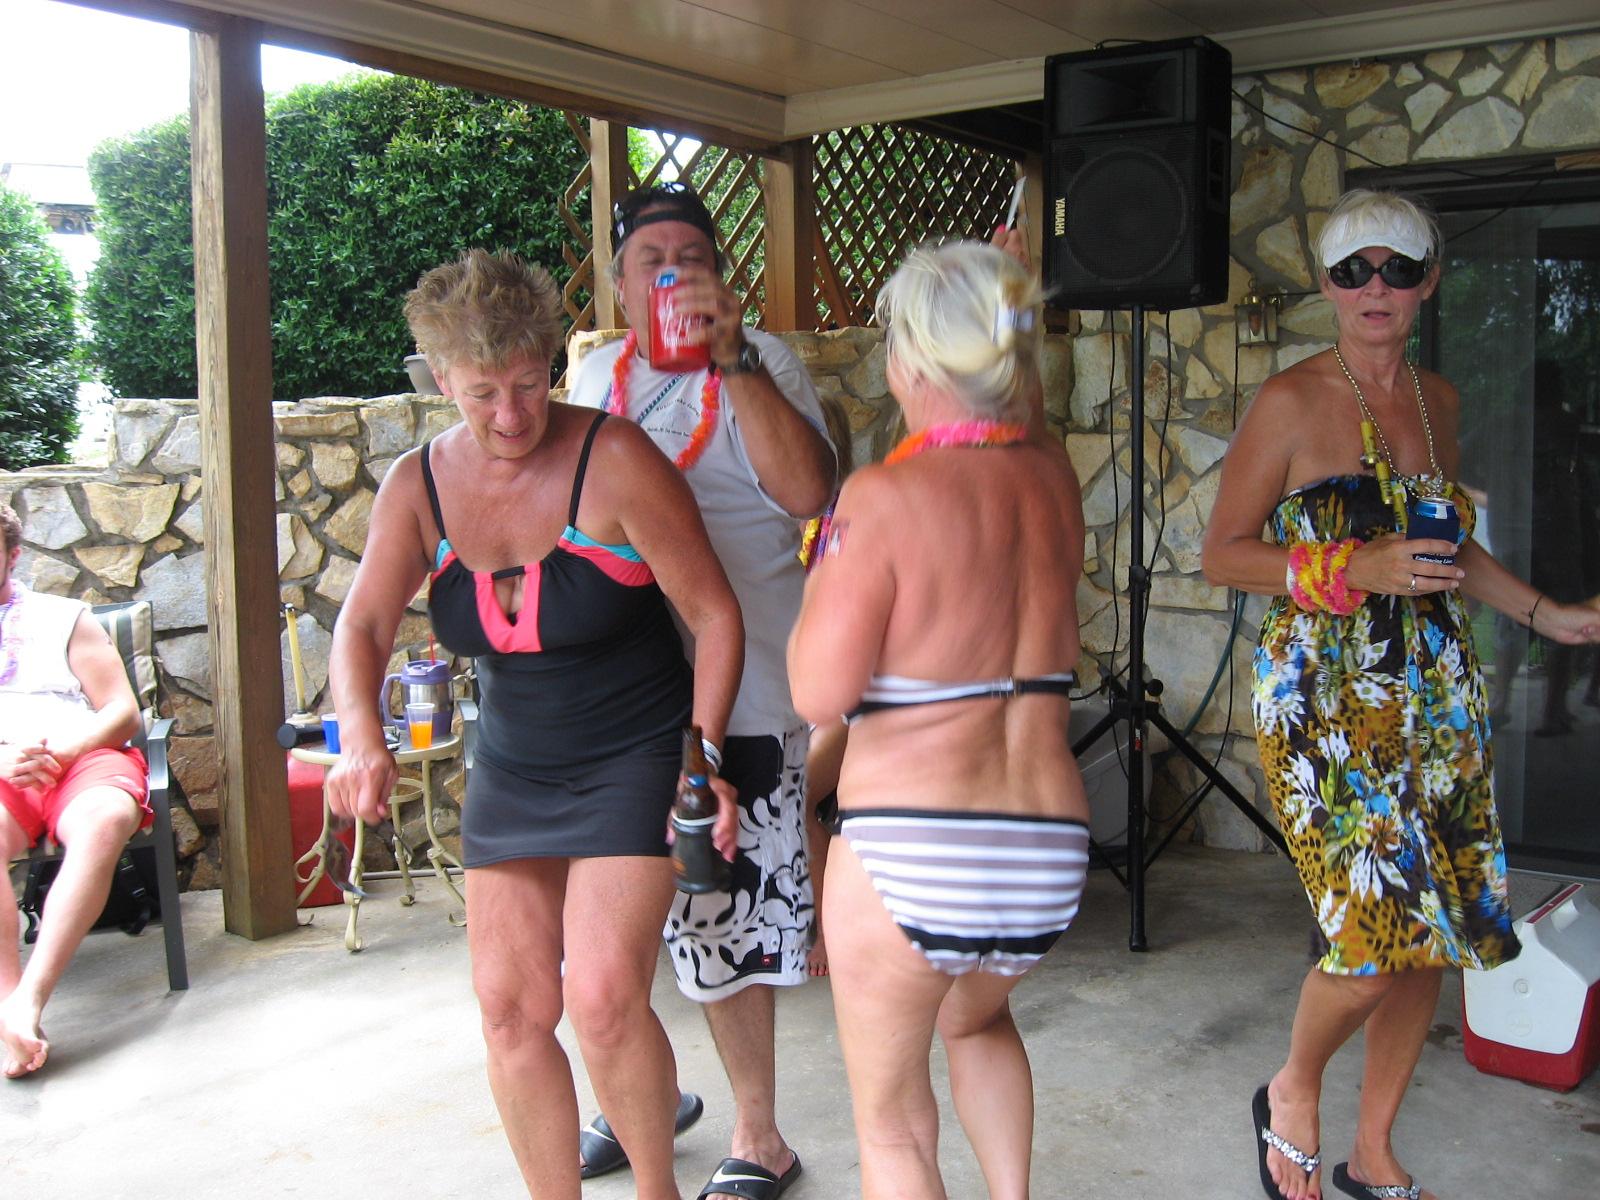 PIRATES OF THE CARIBBEAN - DANCING